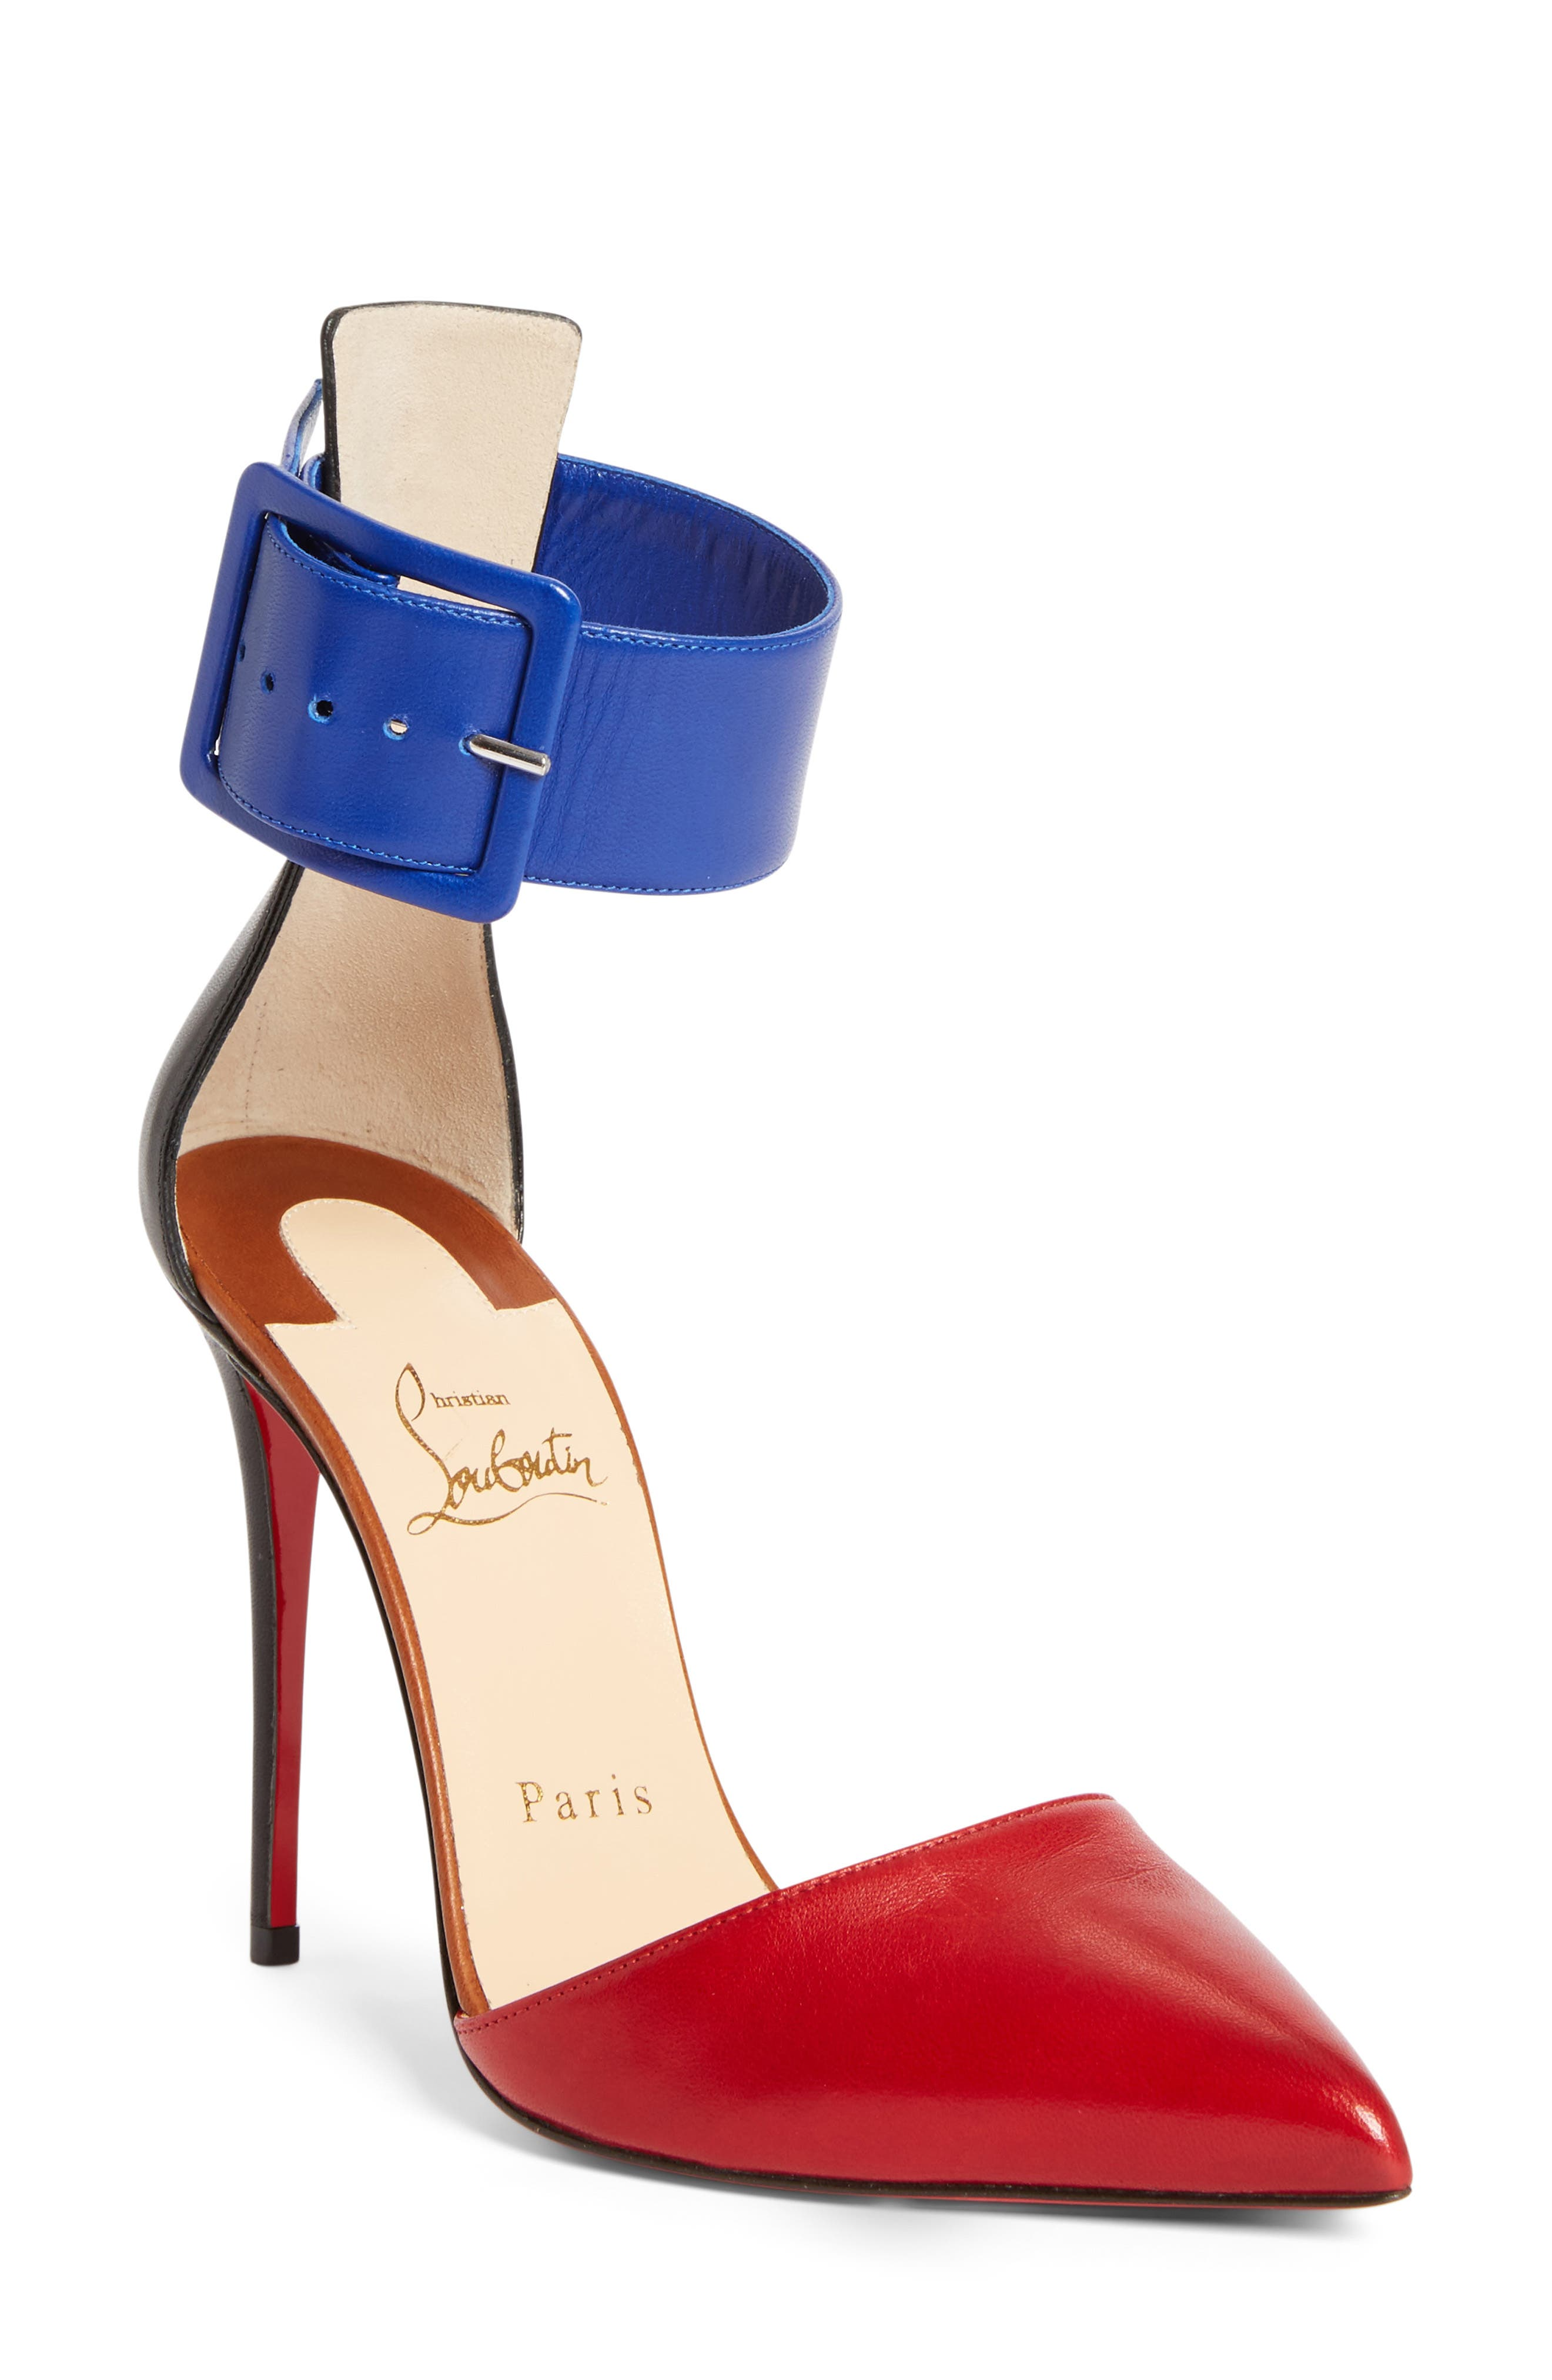 Alternate Image 1 Selected - Christian Louboutin Harler Ankle Strap Pump (Women)